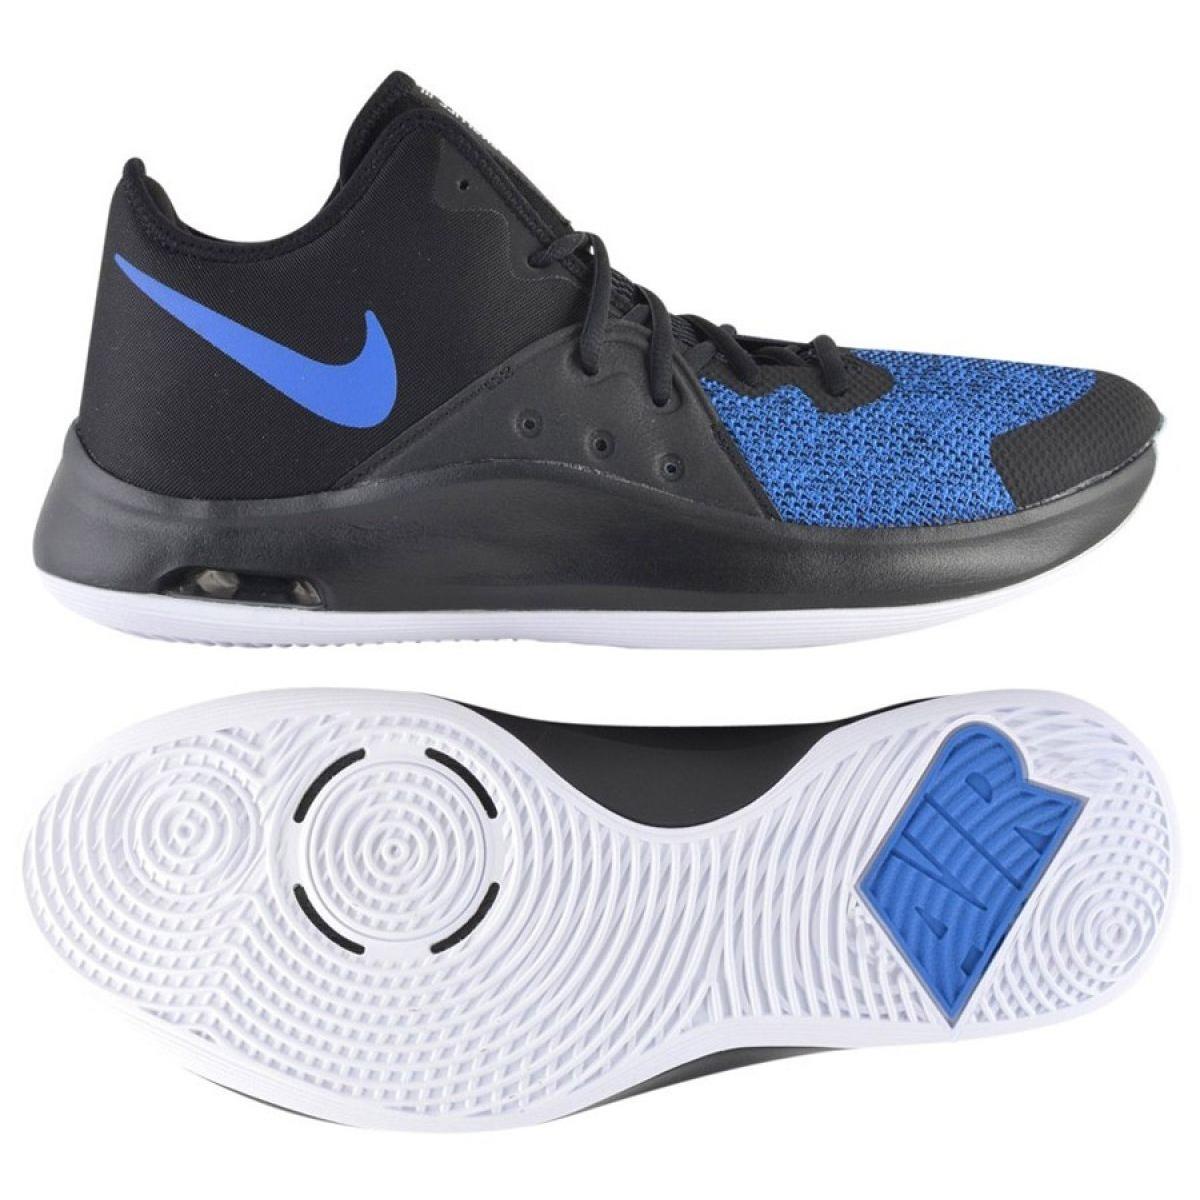 Buty koszykarskie Nike Air Max Infuriate 2 MID M AA7066 002